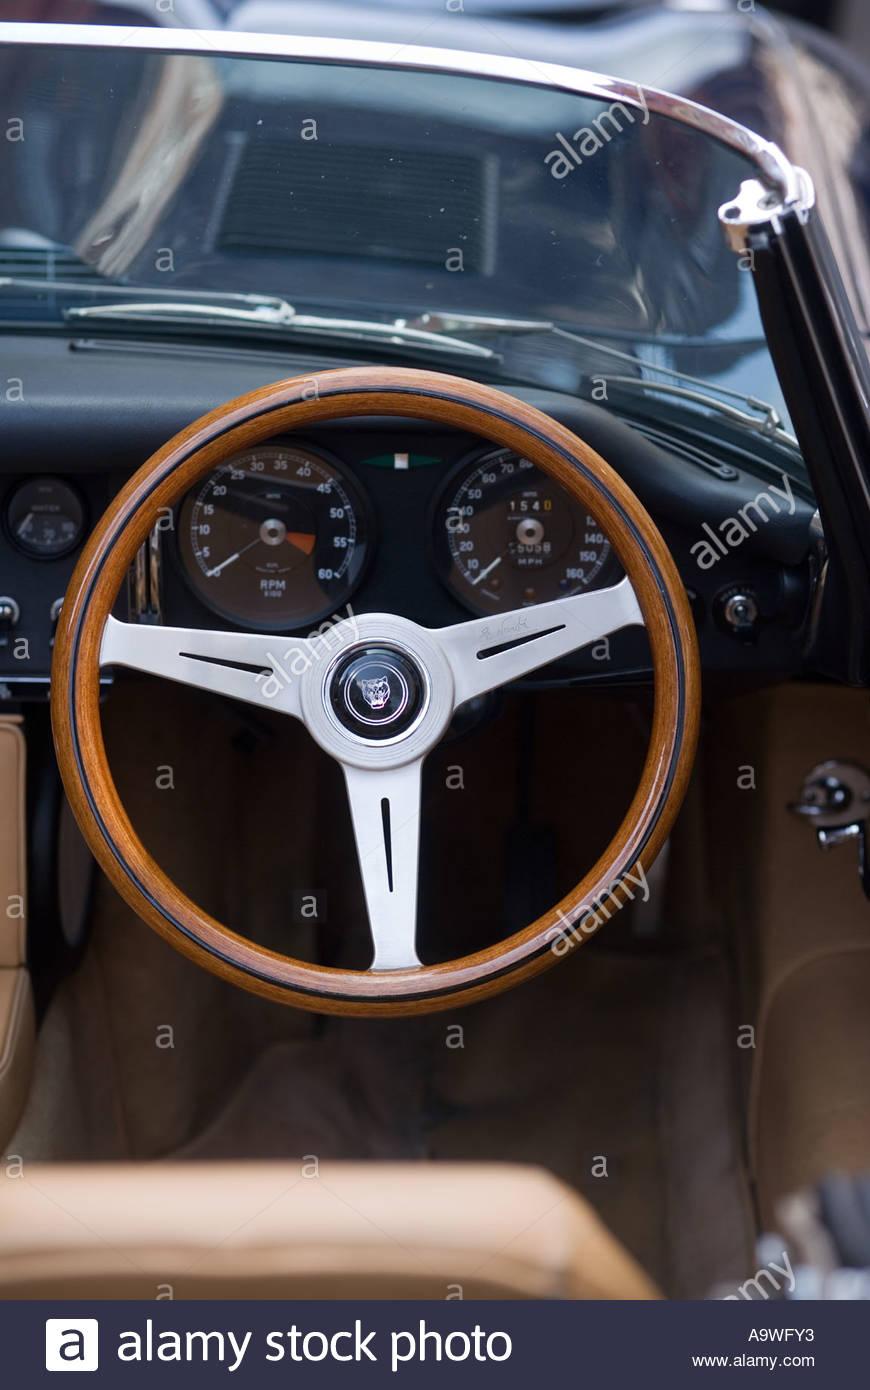 Wooden Steering Wheel Of Jaguar E Type Car Stock Photo 7111922 Alamy